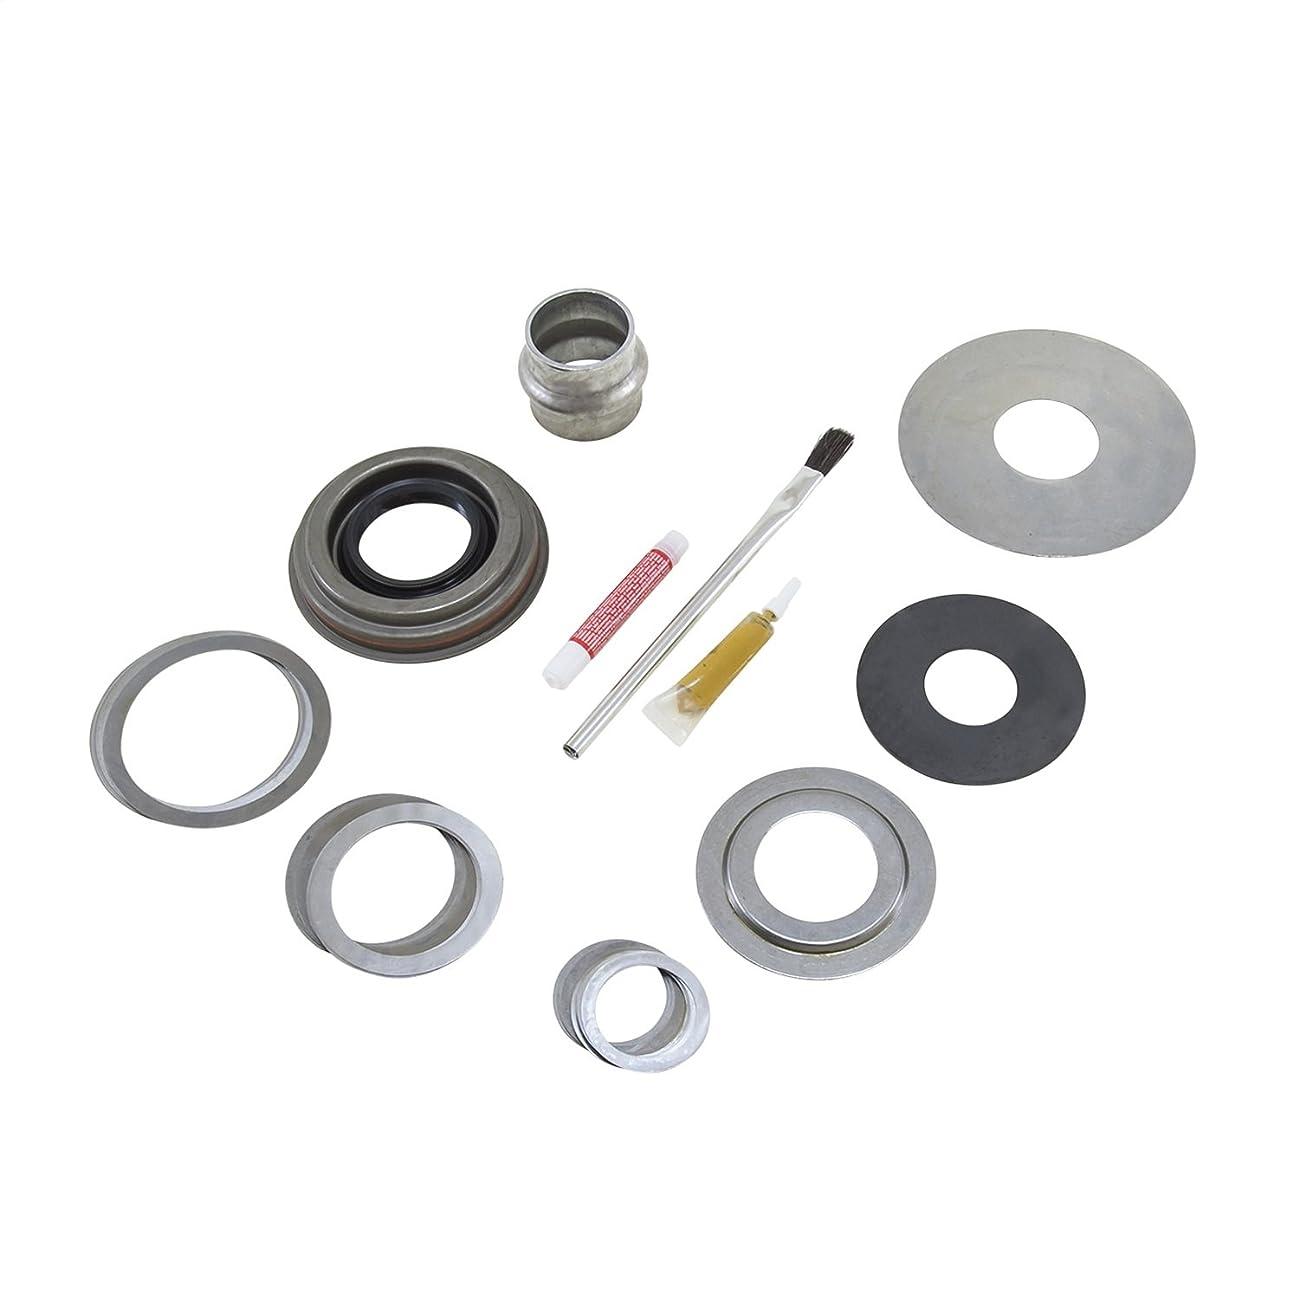 Yukon Gear & Axle (MK D30-TJ) Minor Installation Kit for Dana 30 Short-Pinion Front Differential